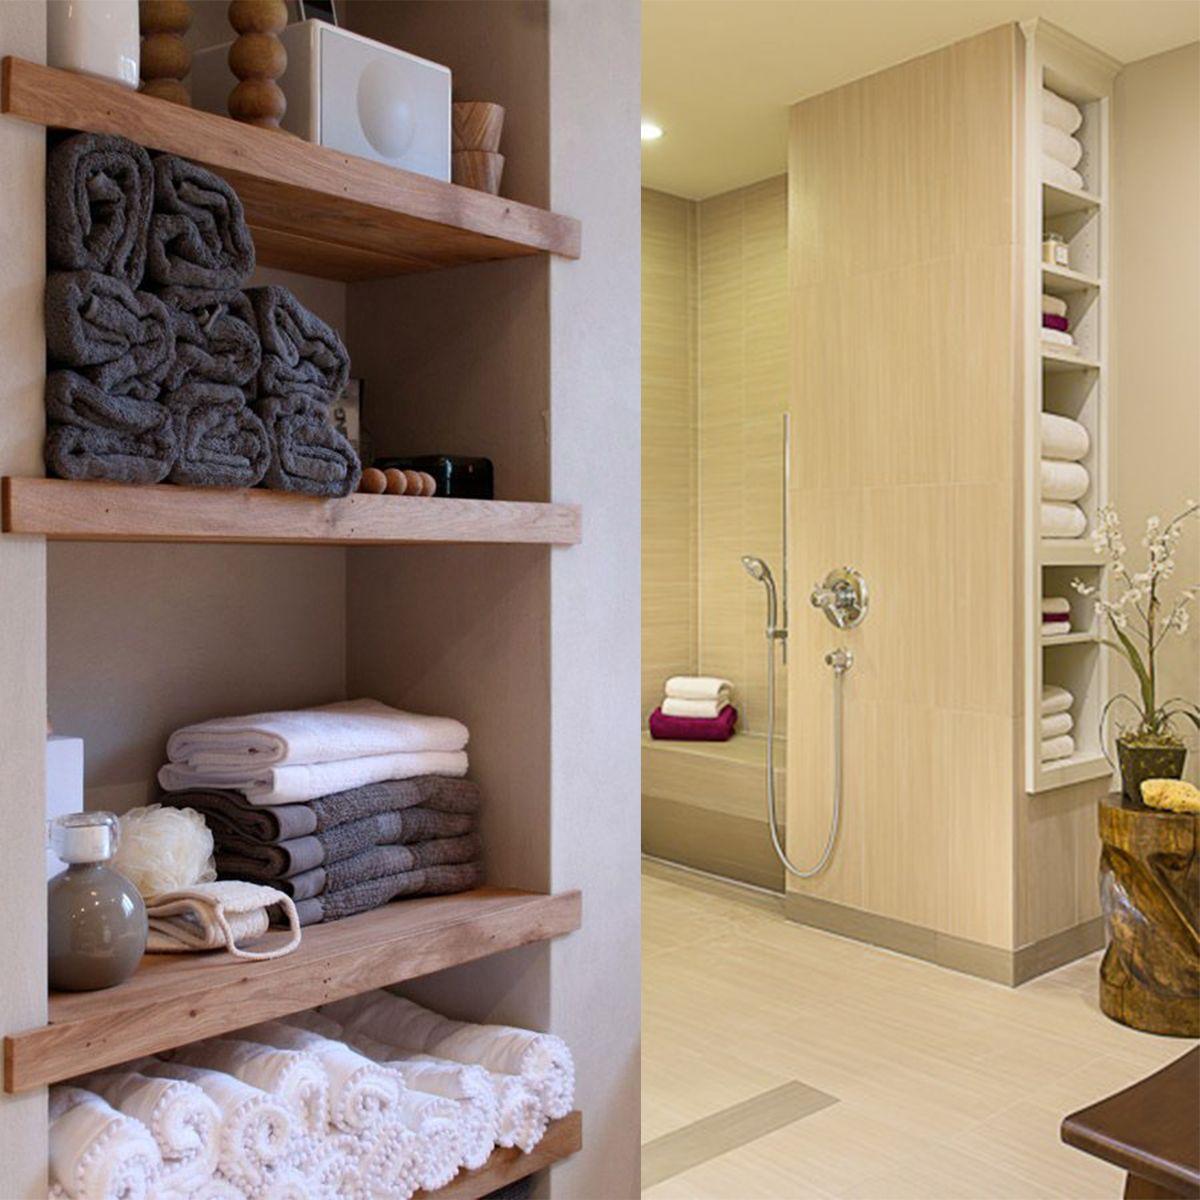 hall linen closet home design pinterest badezimmer baden und g ste wc. Black Bedroom Furniture Sets. Home Design Ideas